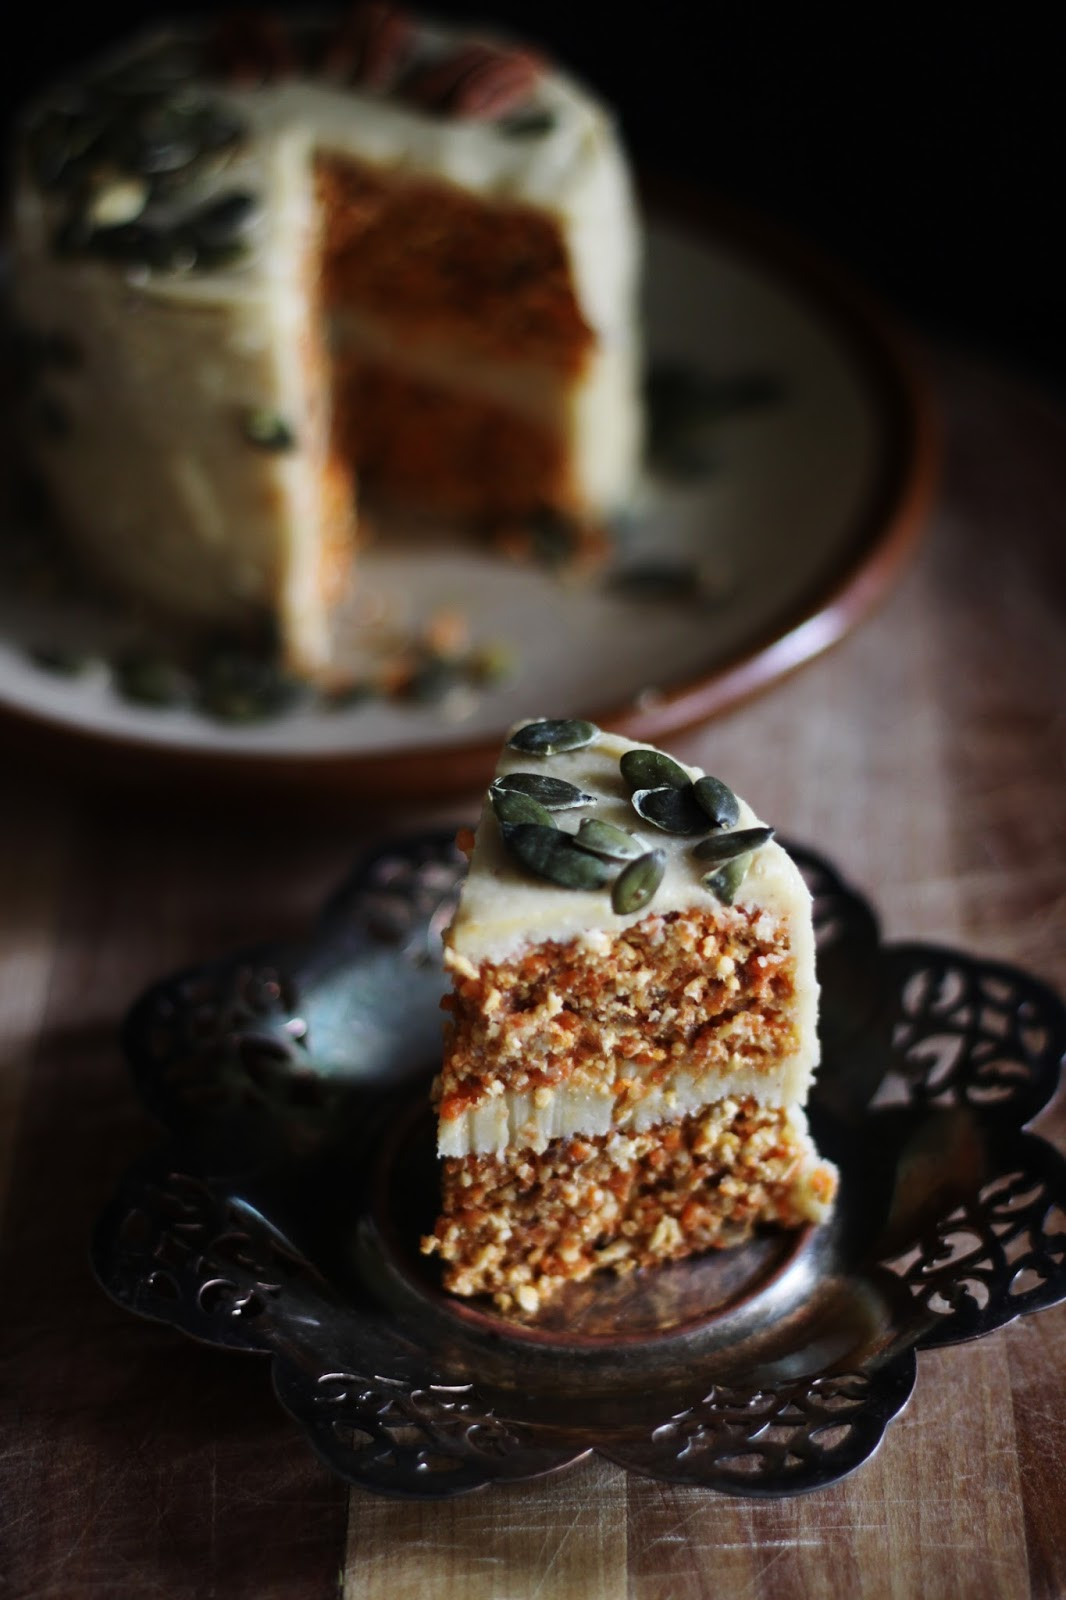 Vegan Carrot Cake Recipe  This Rawsome Vegan Life RAW VEGAN CARROT CAKE with CREAMY